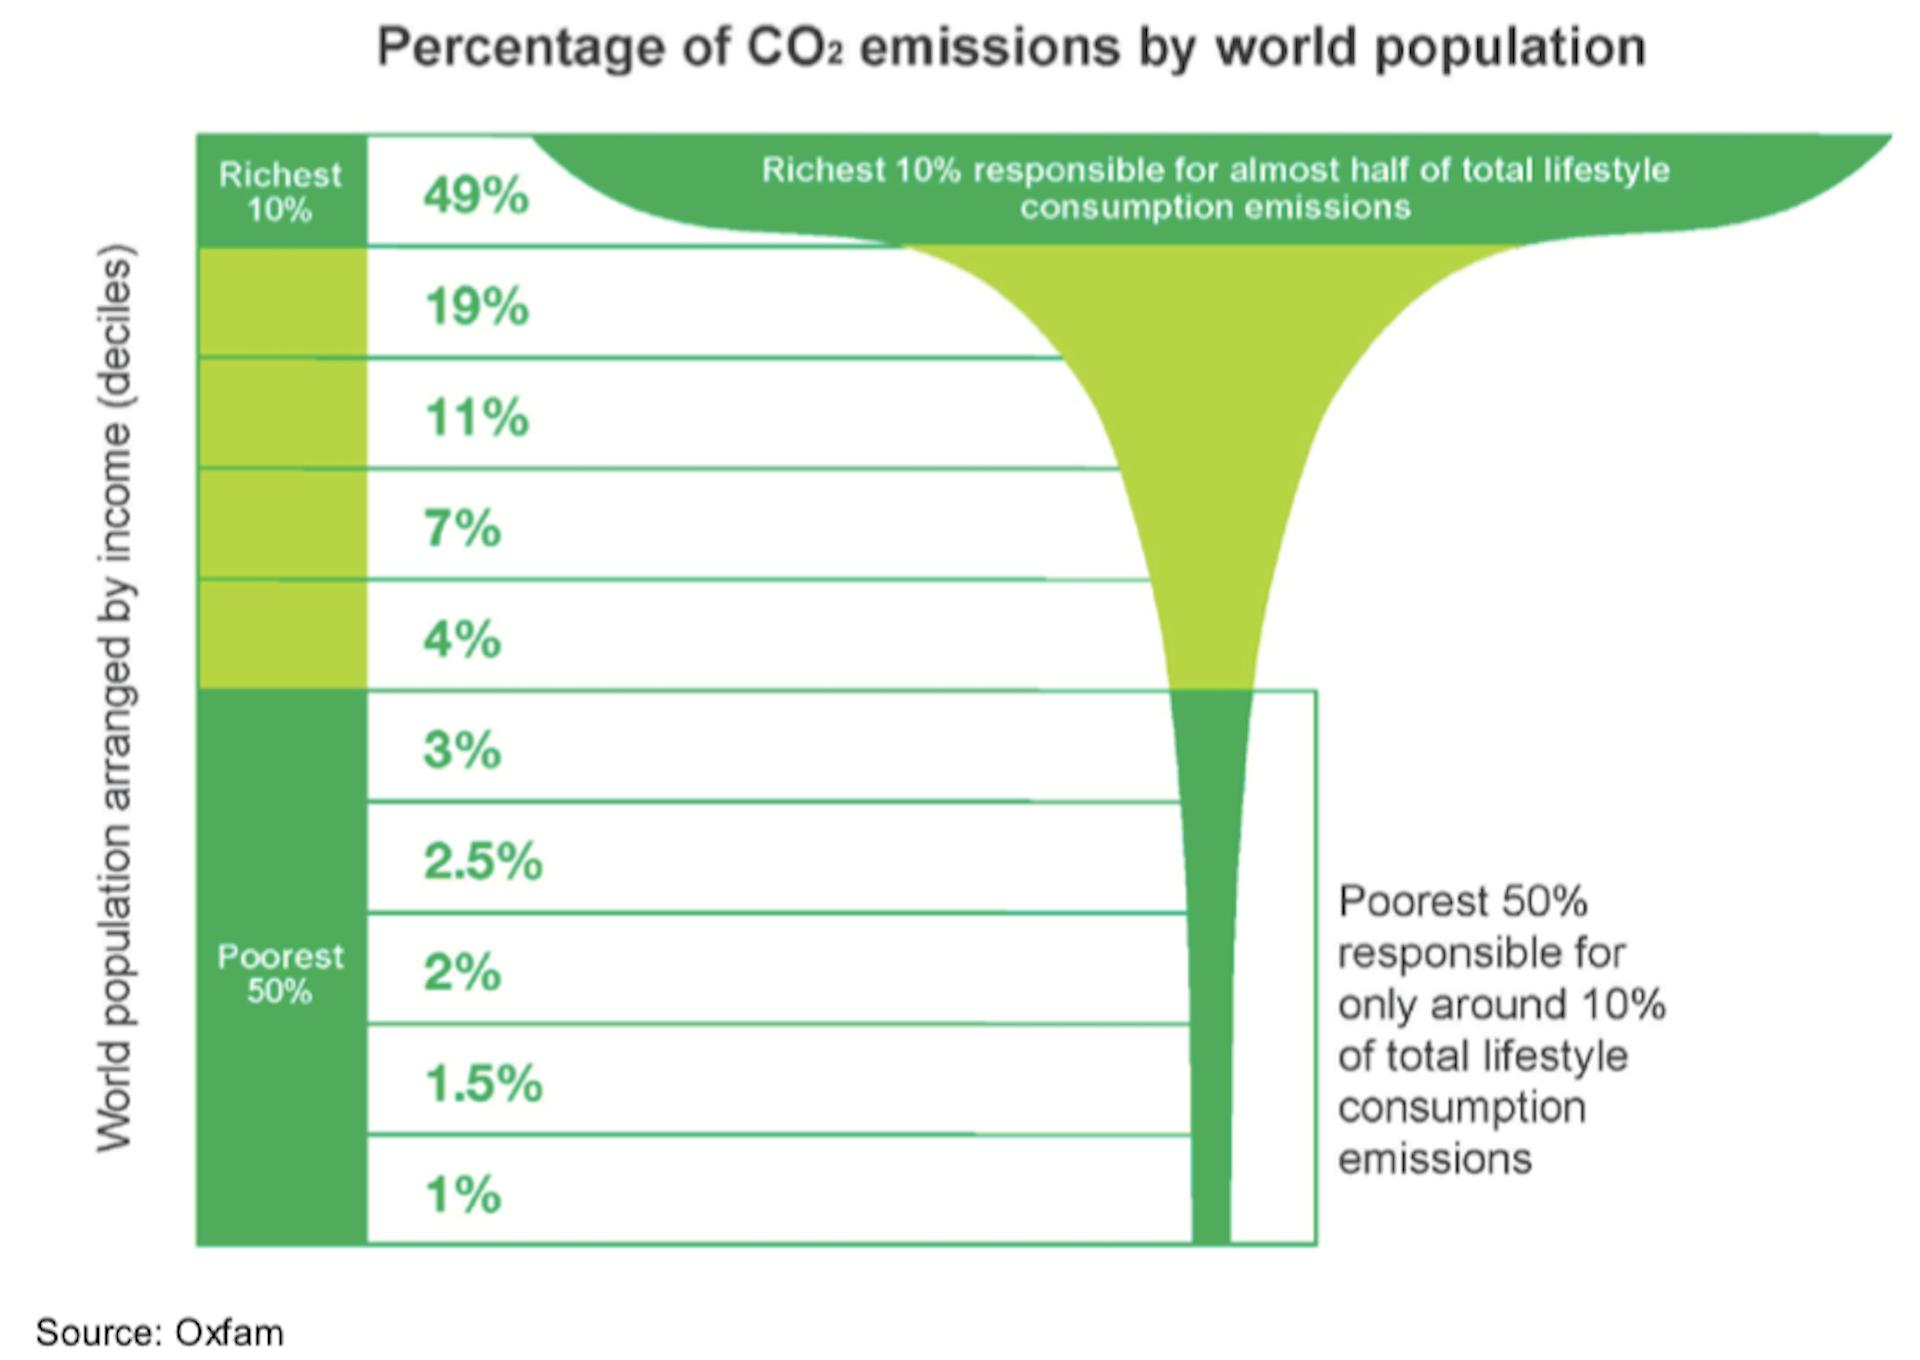 Global emissions inequality.  Oxfam